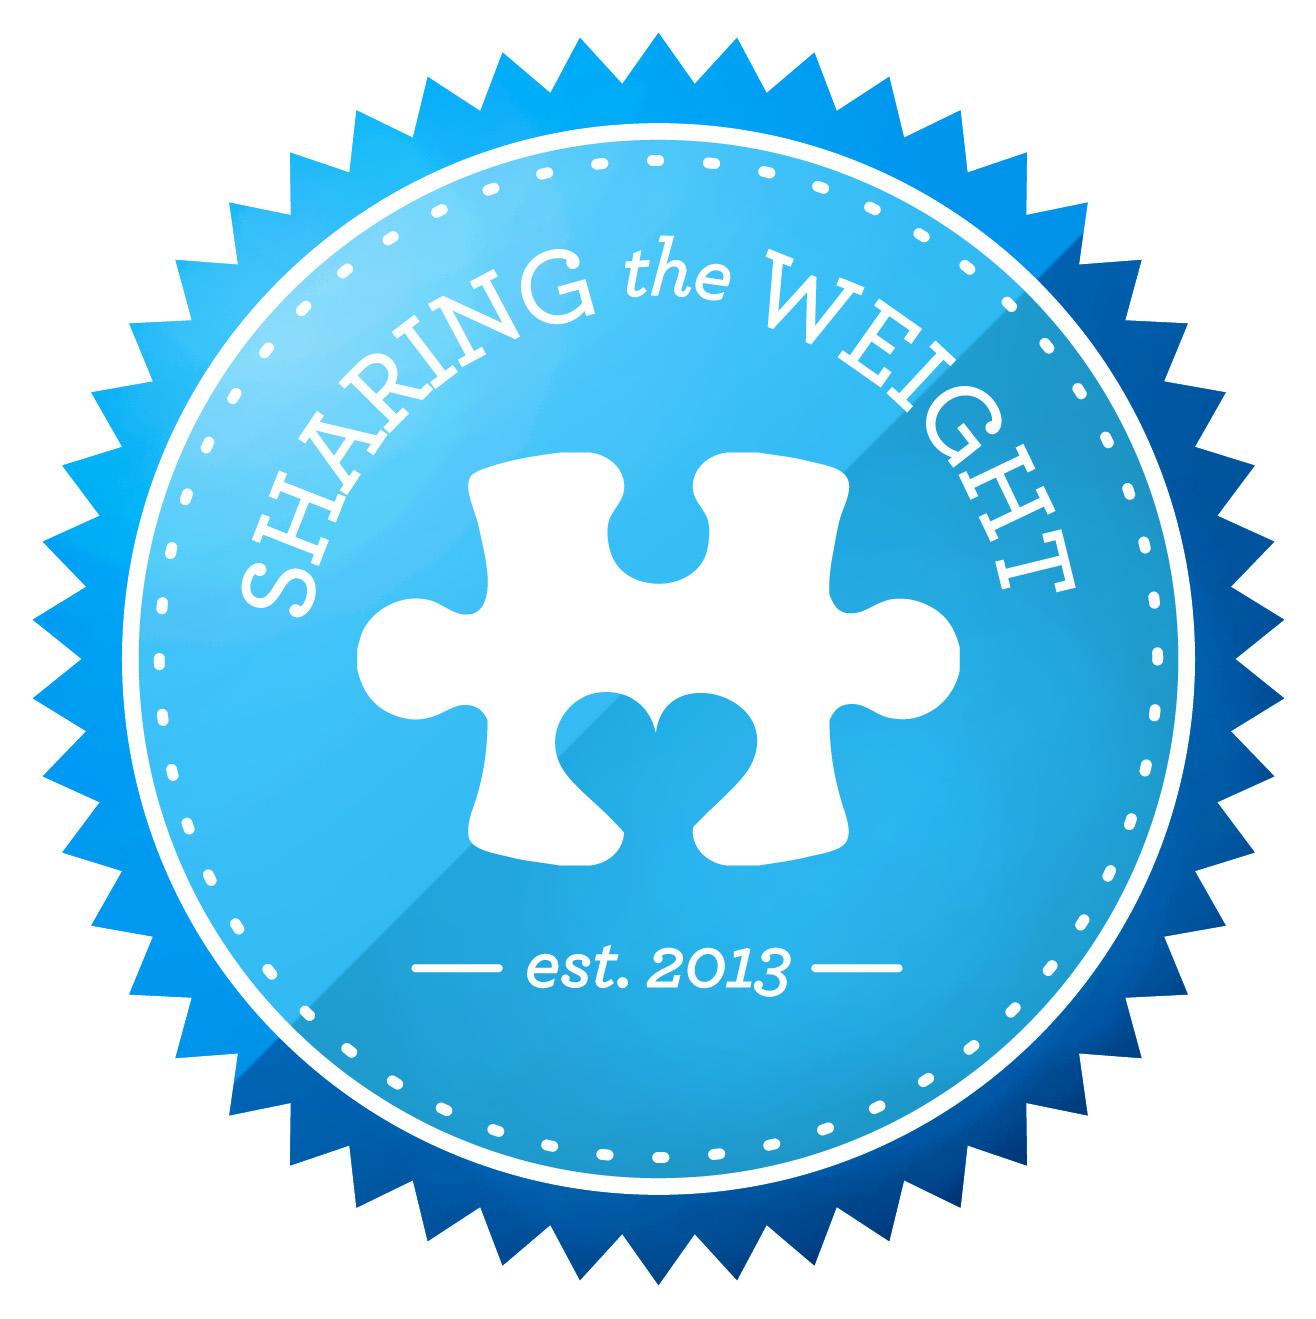 SharingTheWeight-Blue#5EB0A.jpg